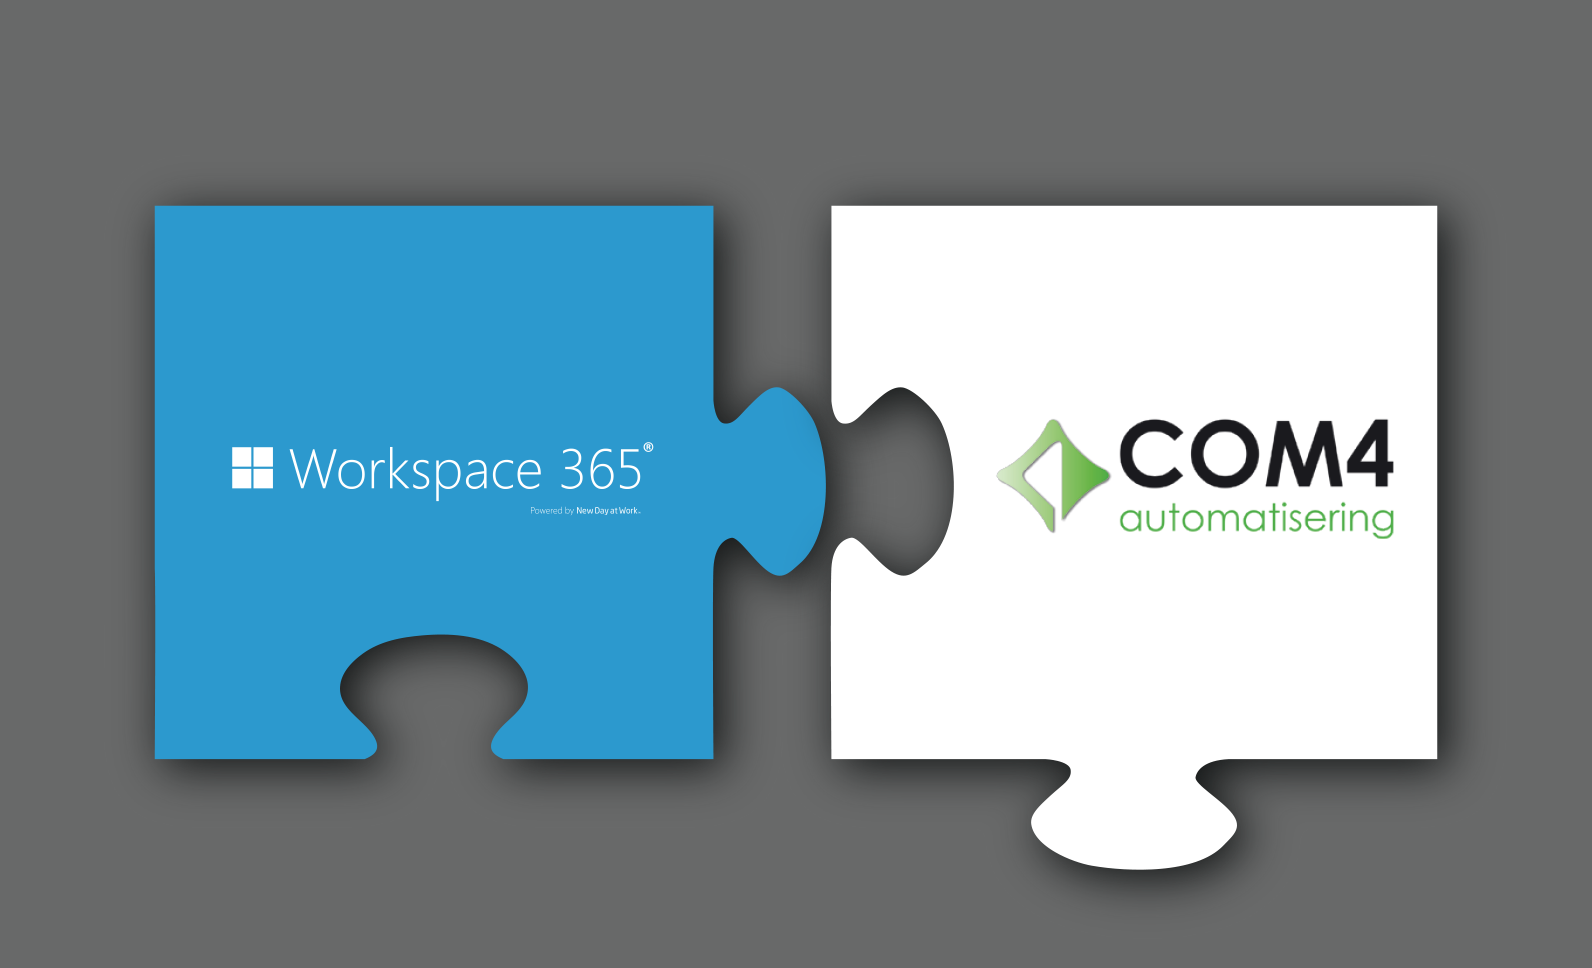 Nieuwe partner Com4 Automatisering